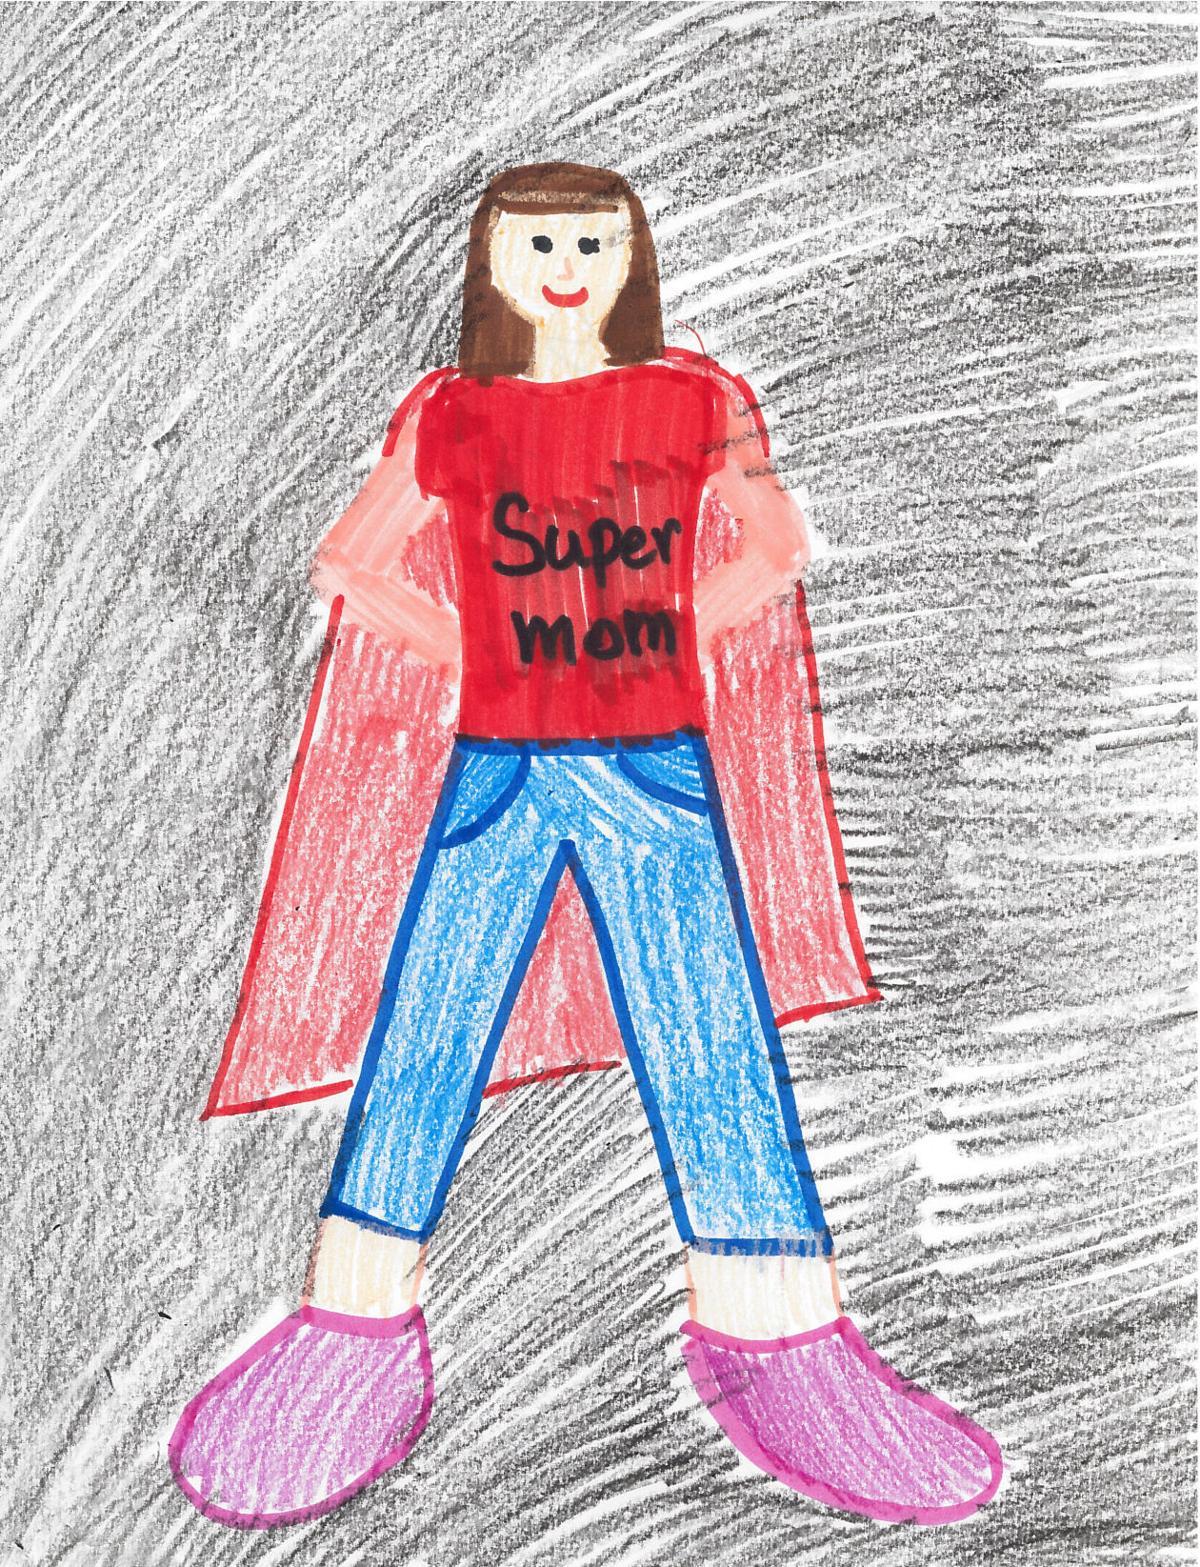 Rayhona Parmonova, grade 4, Stevenson